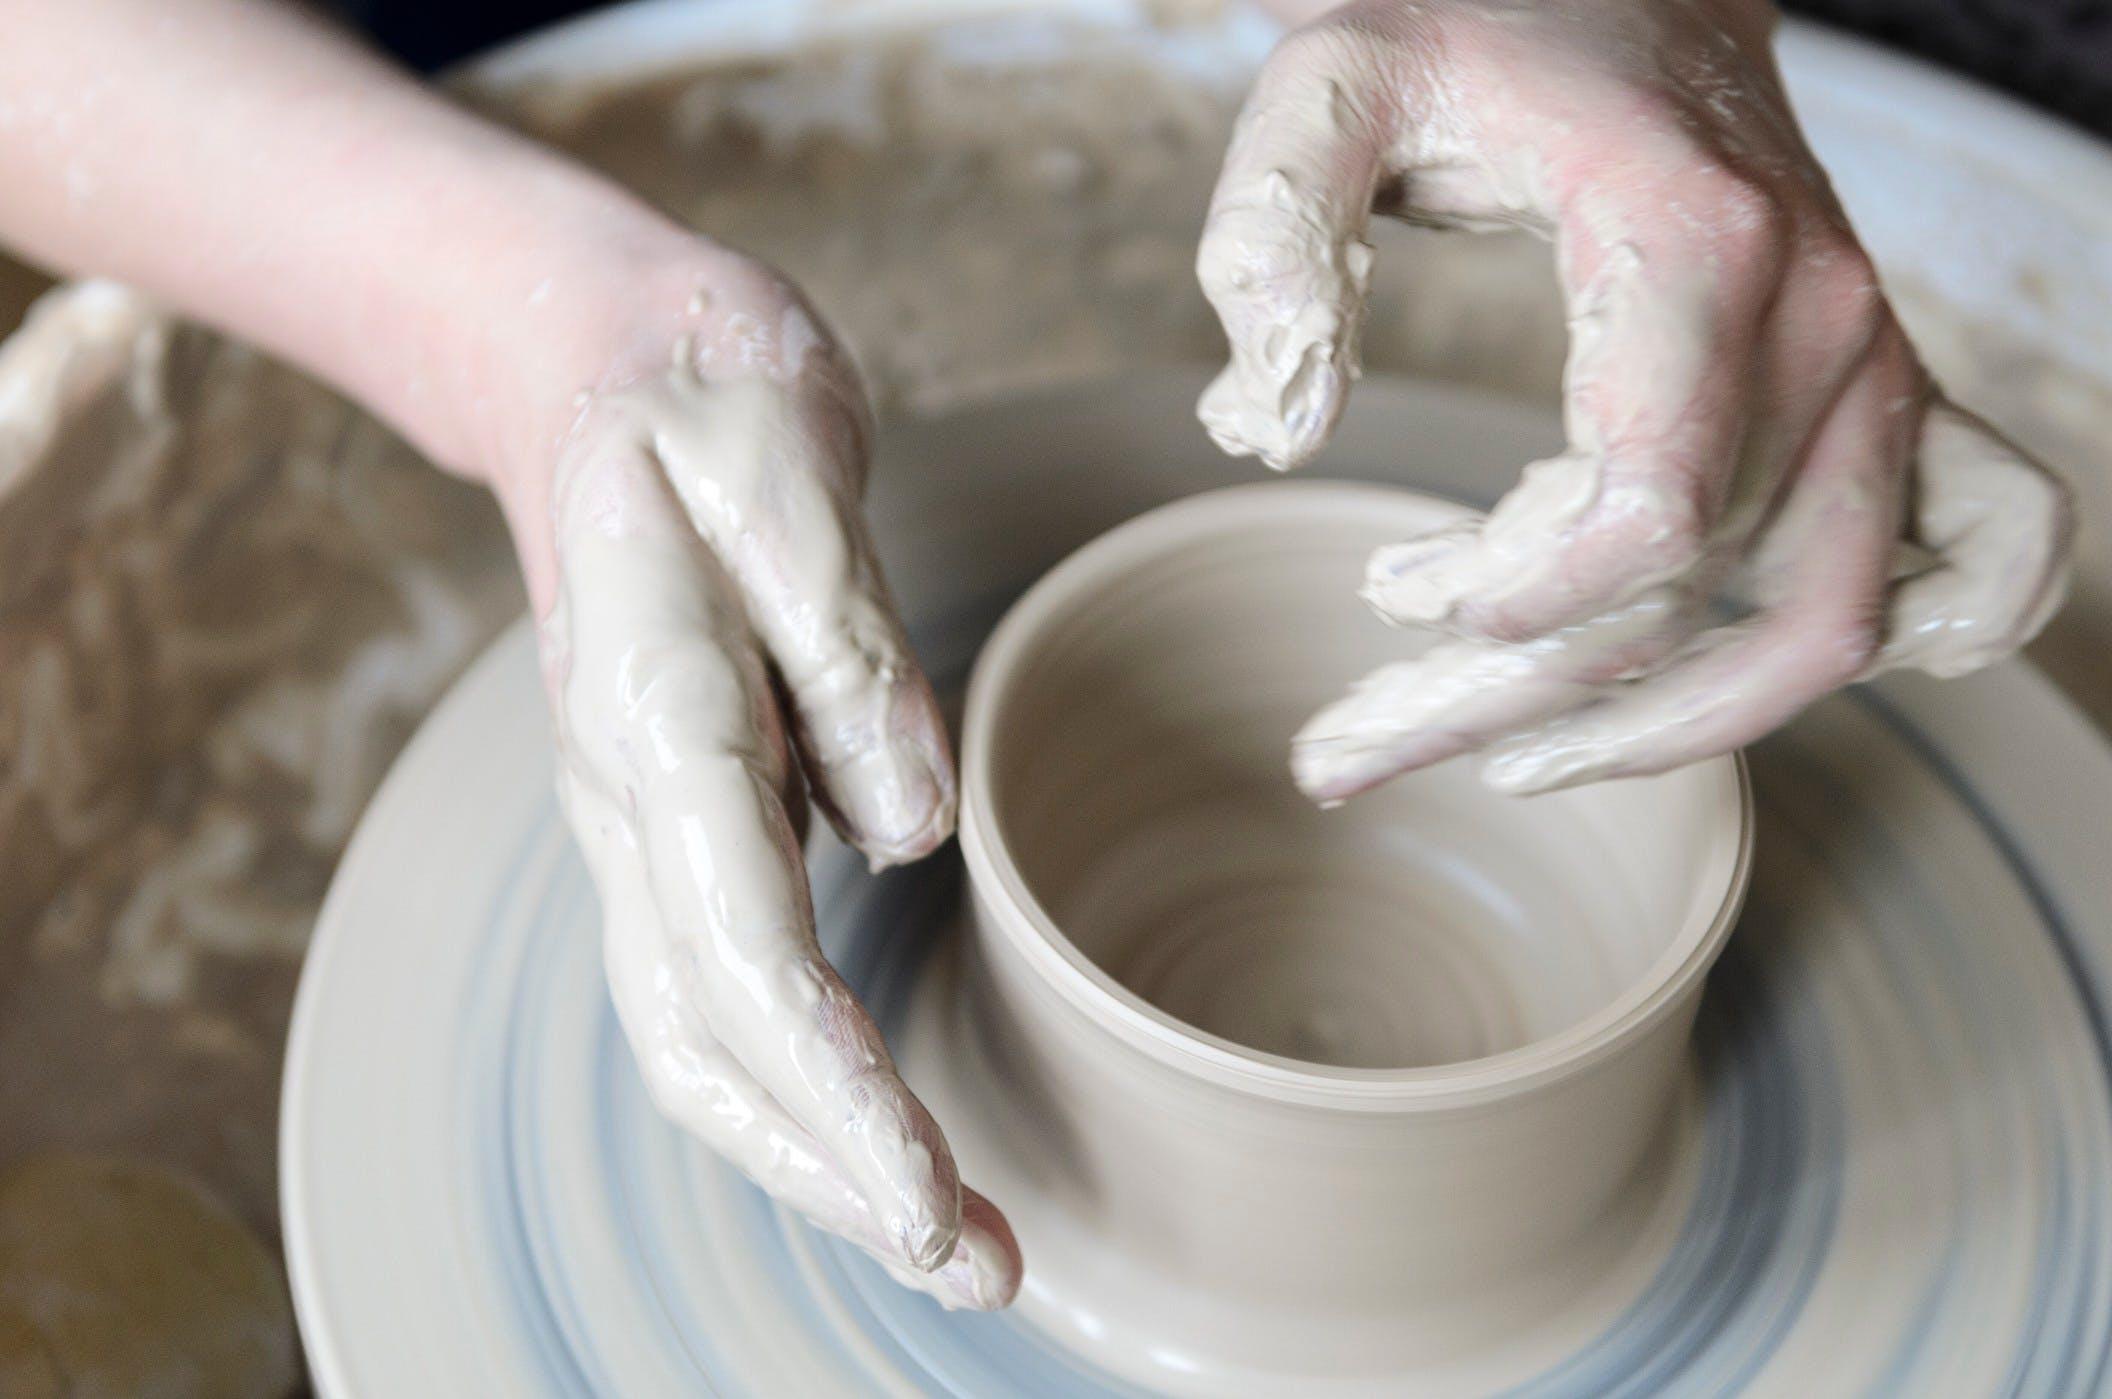 lillstreet art center pottery class chicago experience gifts